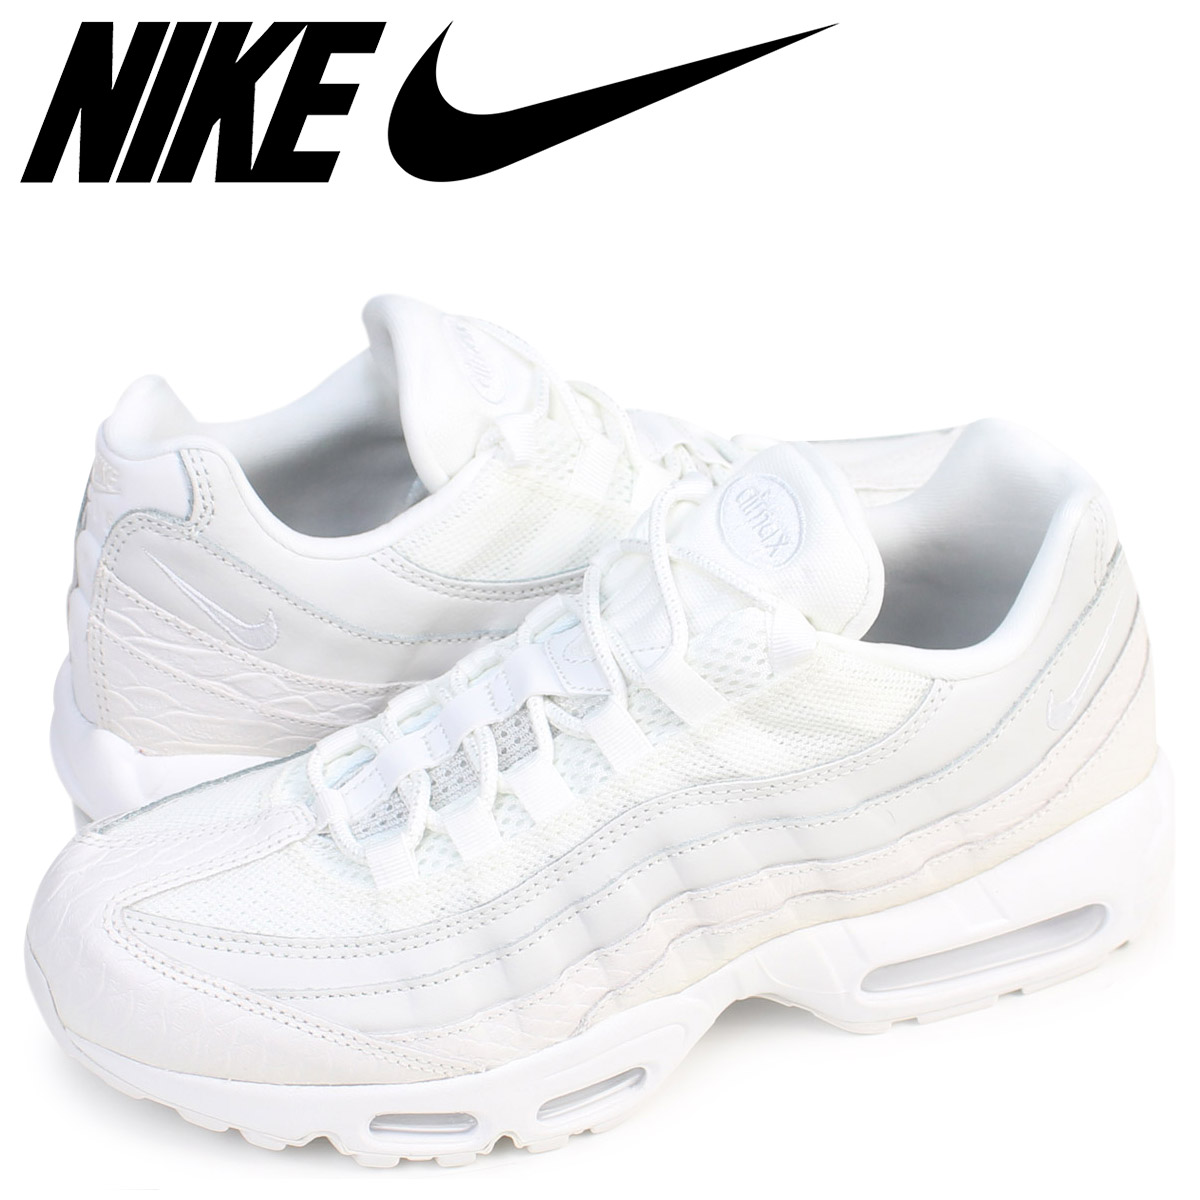 NIKE Kie Ney AMAX 95 sneakers AIR MAX 95 PREMIUM 538,416 100 men's shoes white